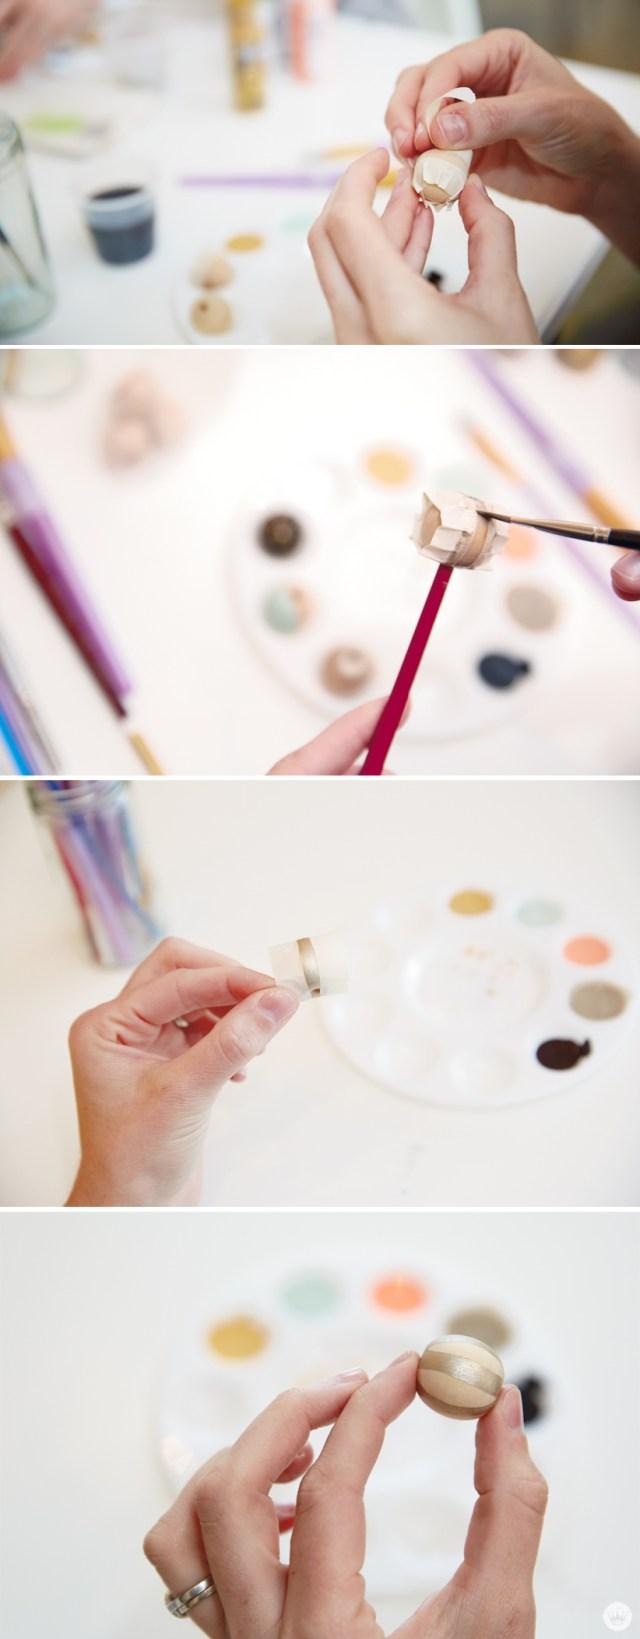 DIY Painted Bead Necklace from Hallmark | thinkmakeshareblog.com